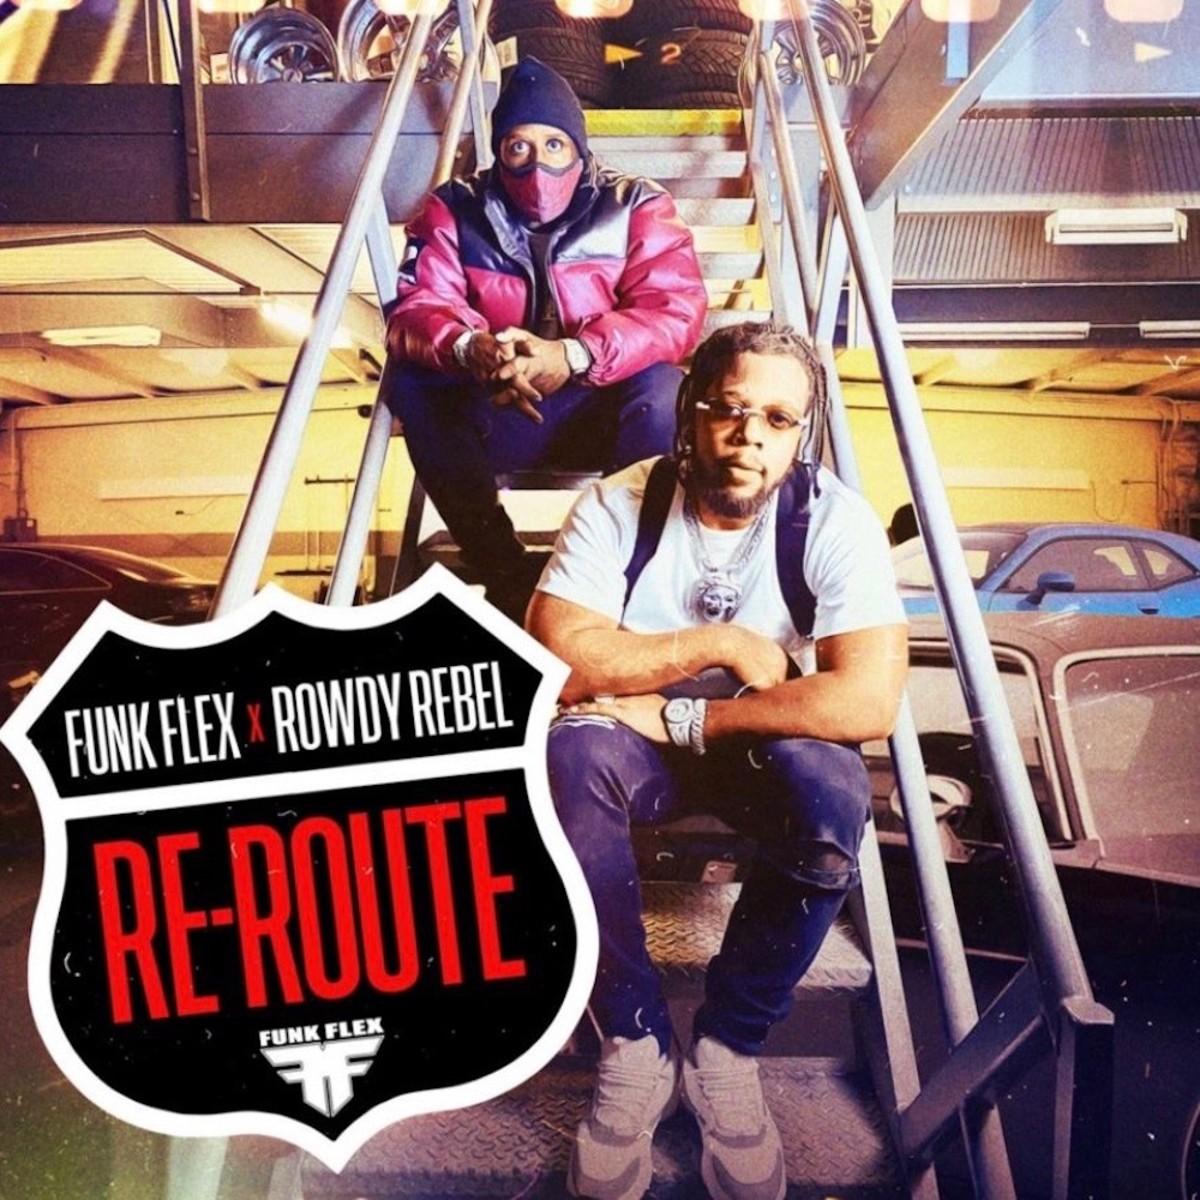 Rowdy Rebel и Funk Flex делятся видео на новый трек «Re-Route»